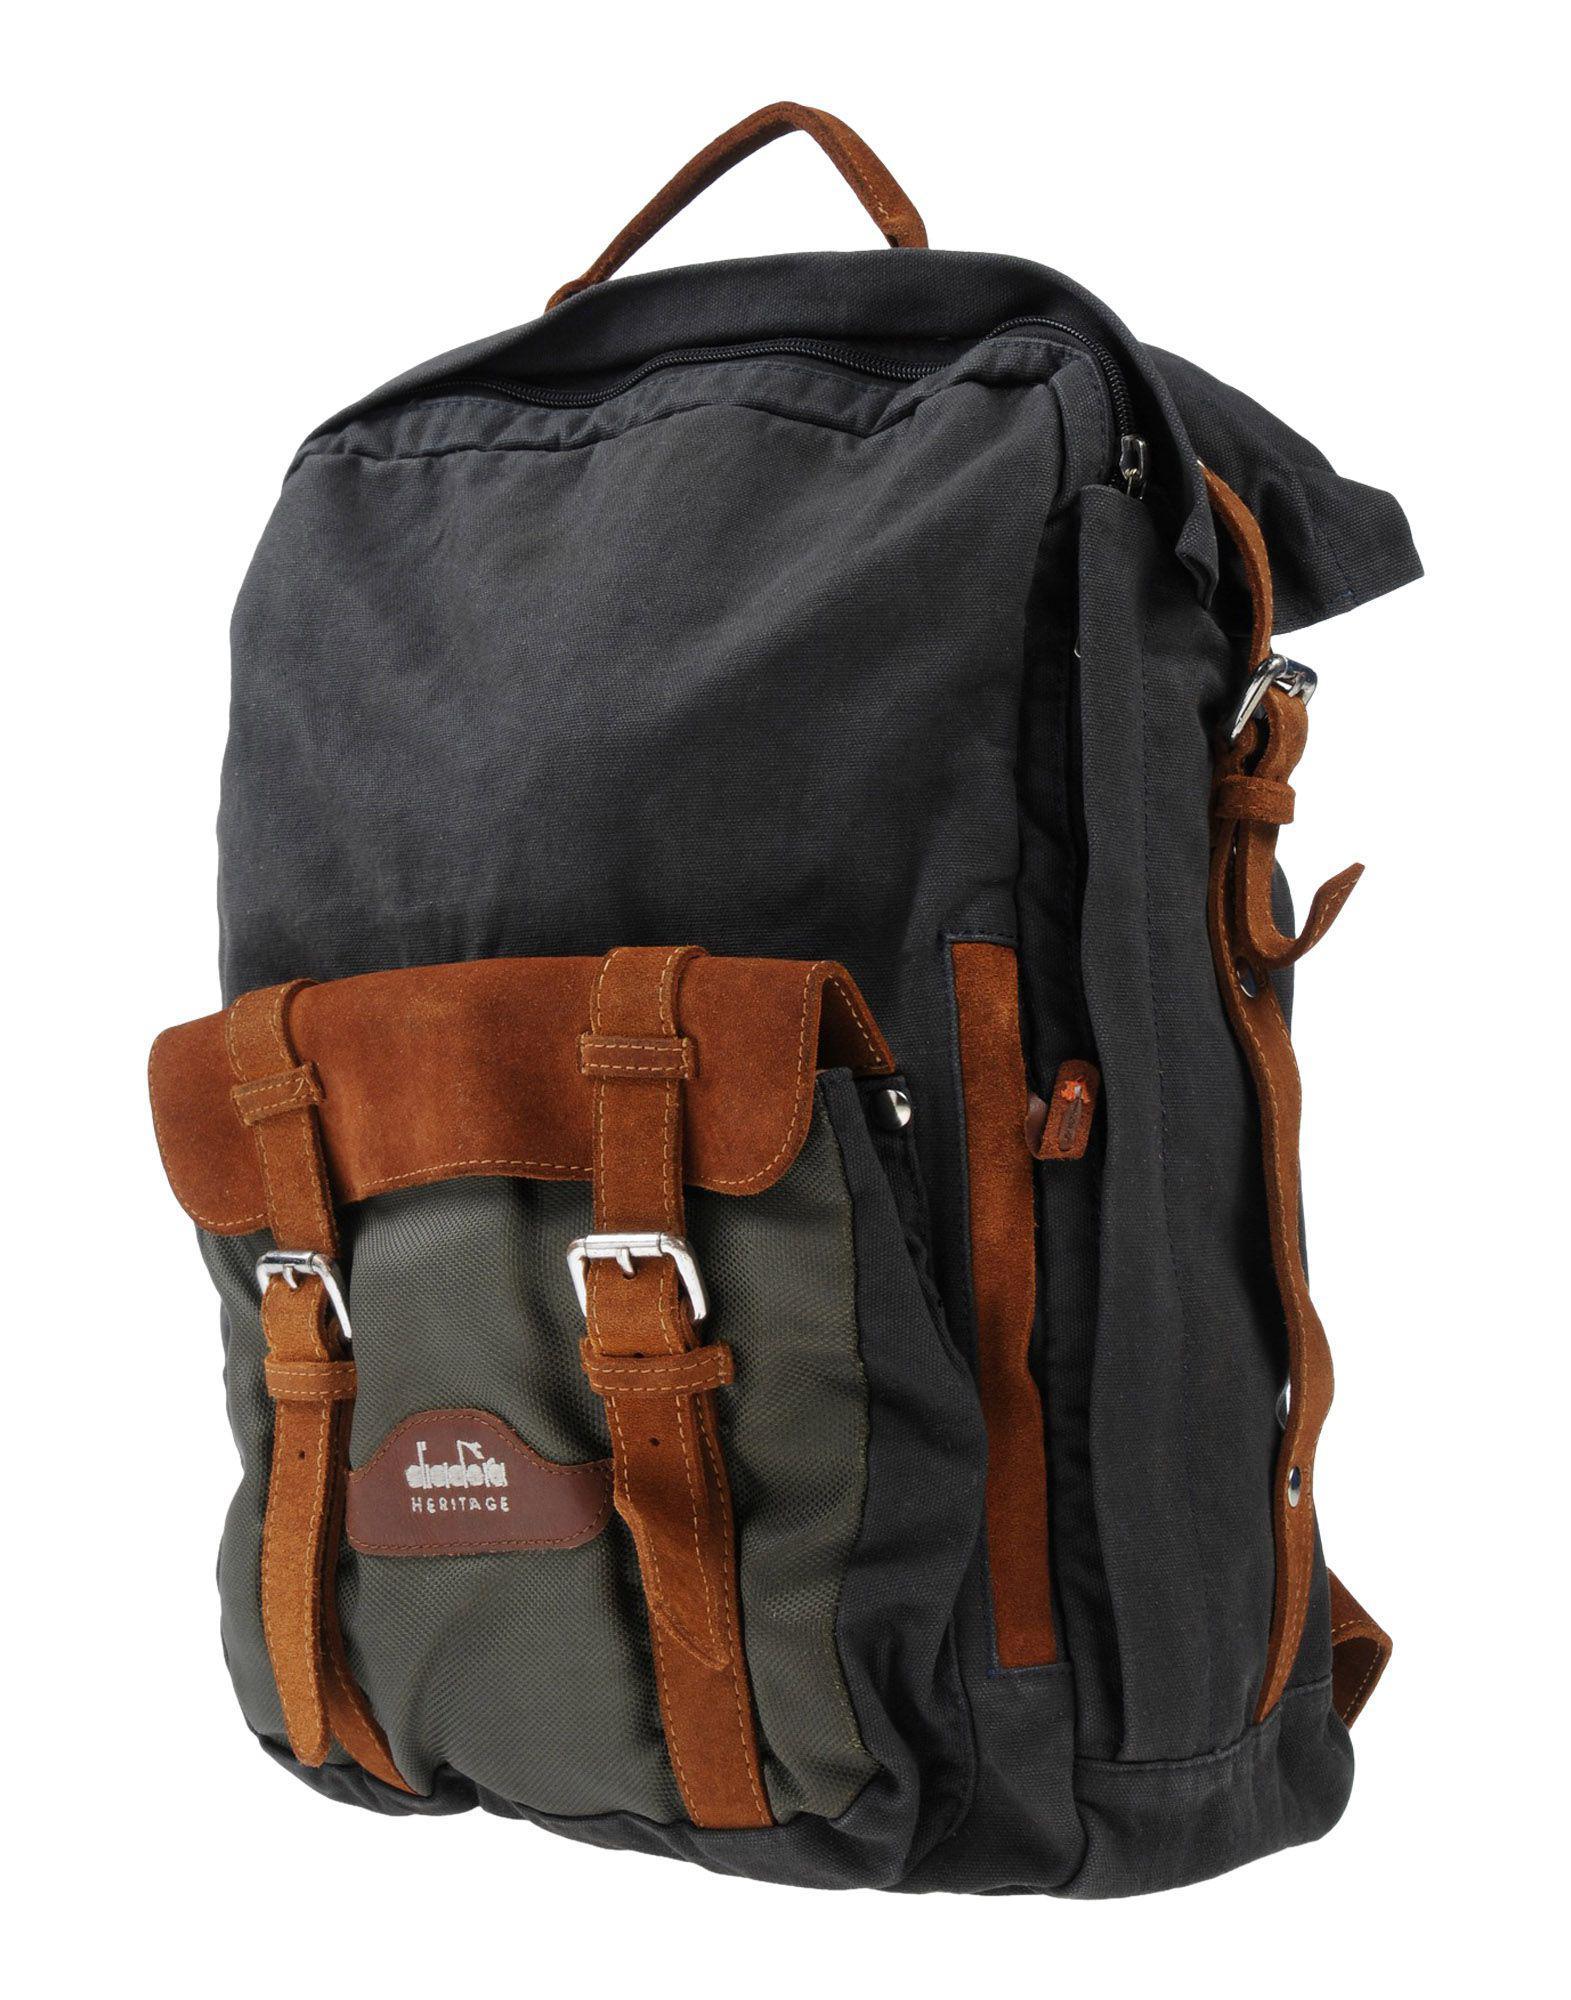 Bags Backpacks In amp; Gray Diadora Lyst Bum HTwgx1t1